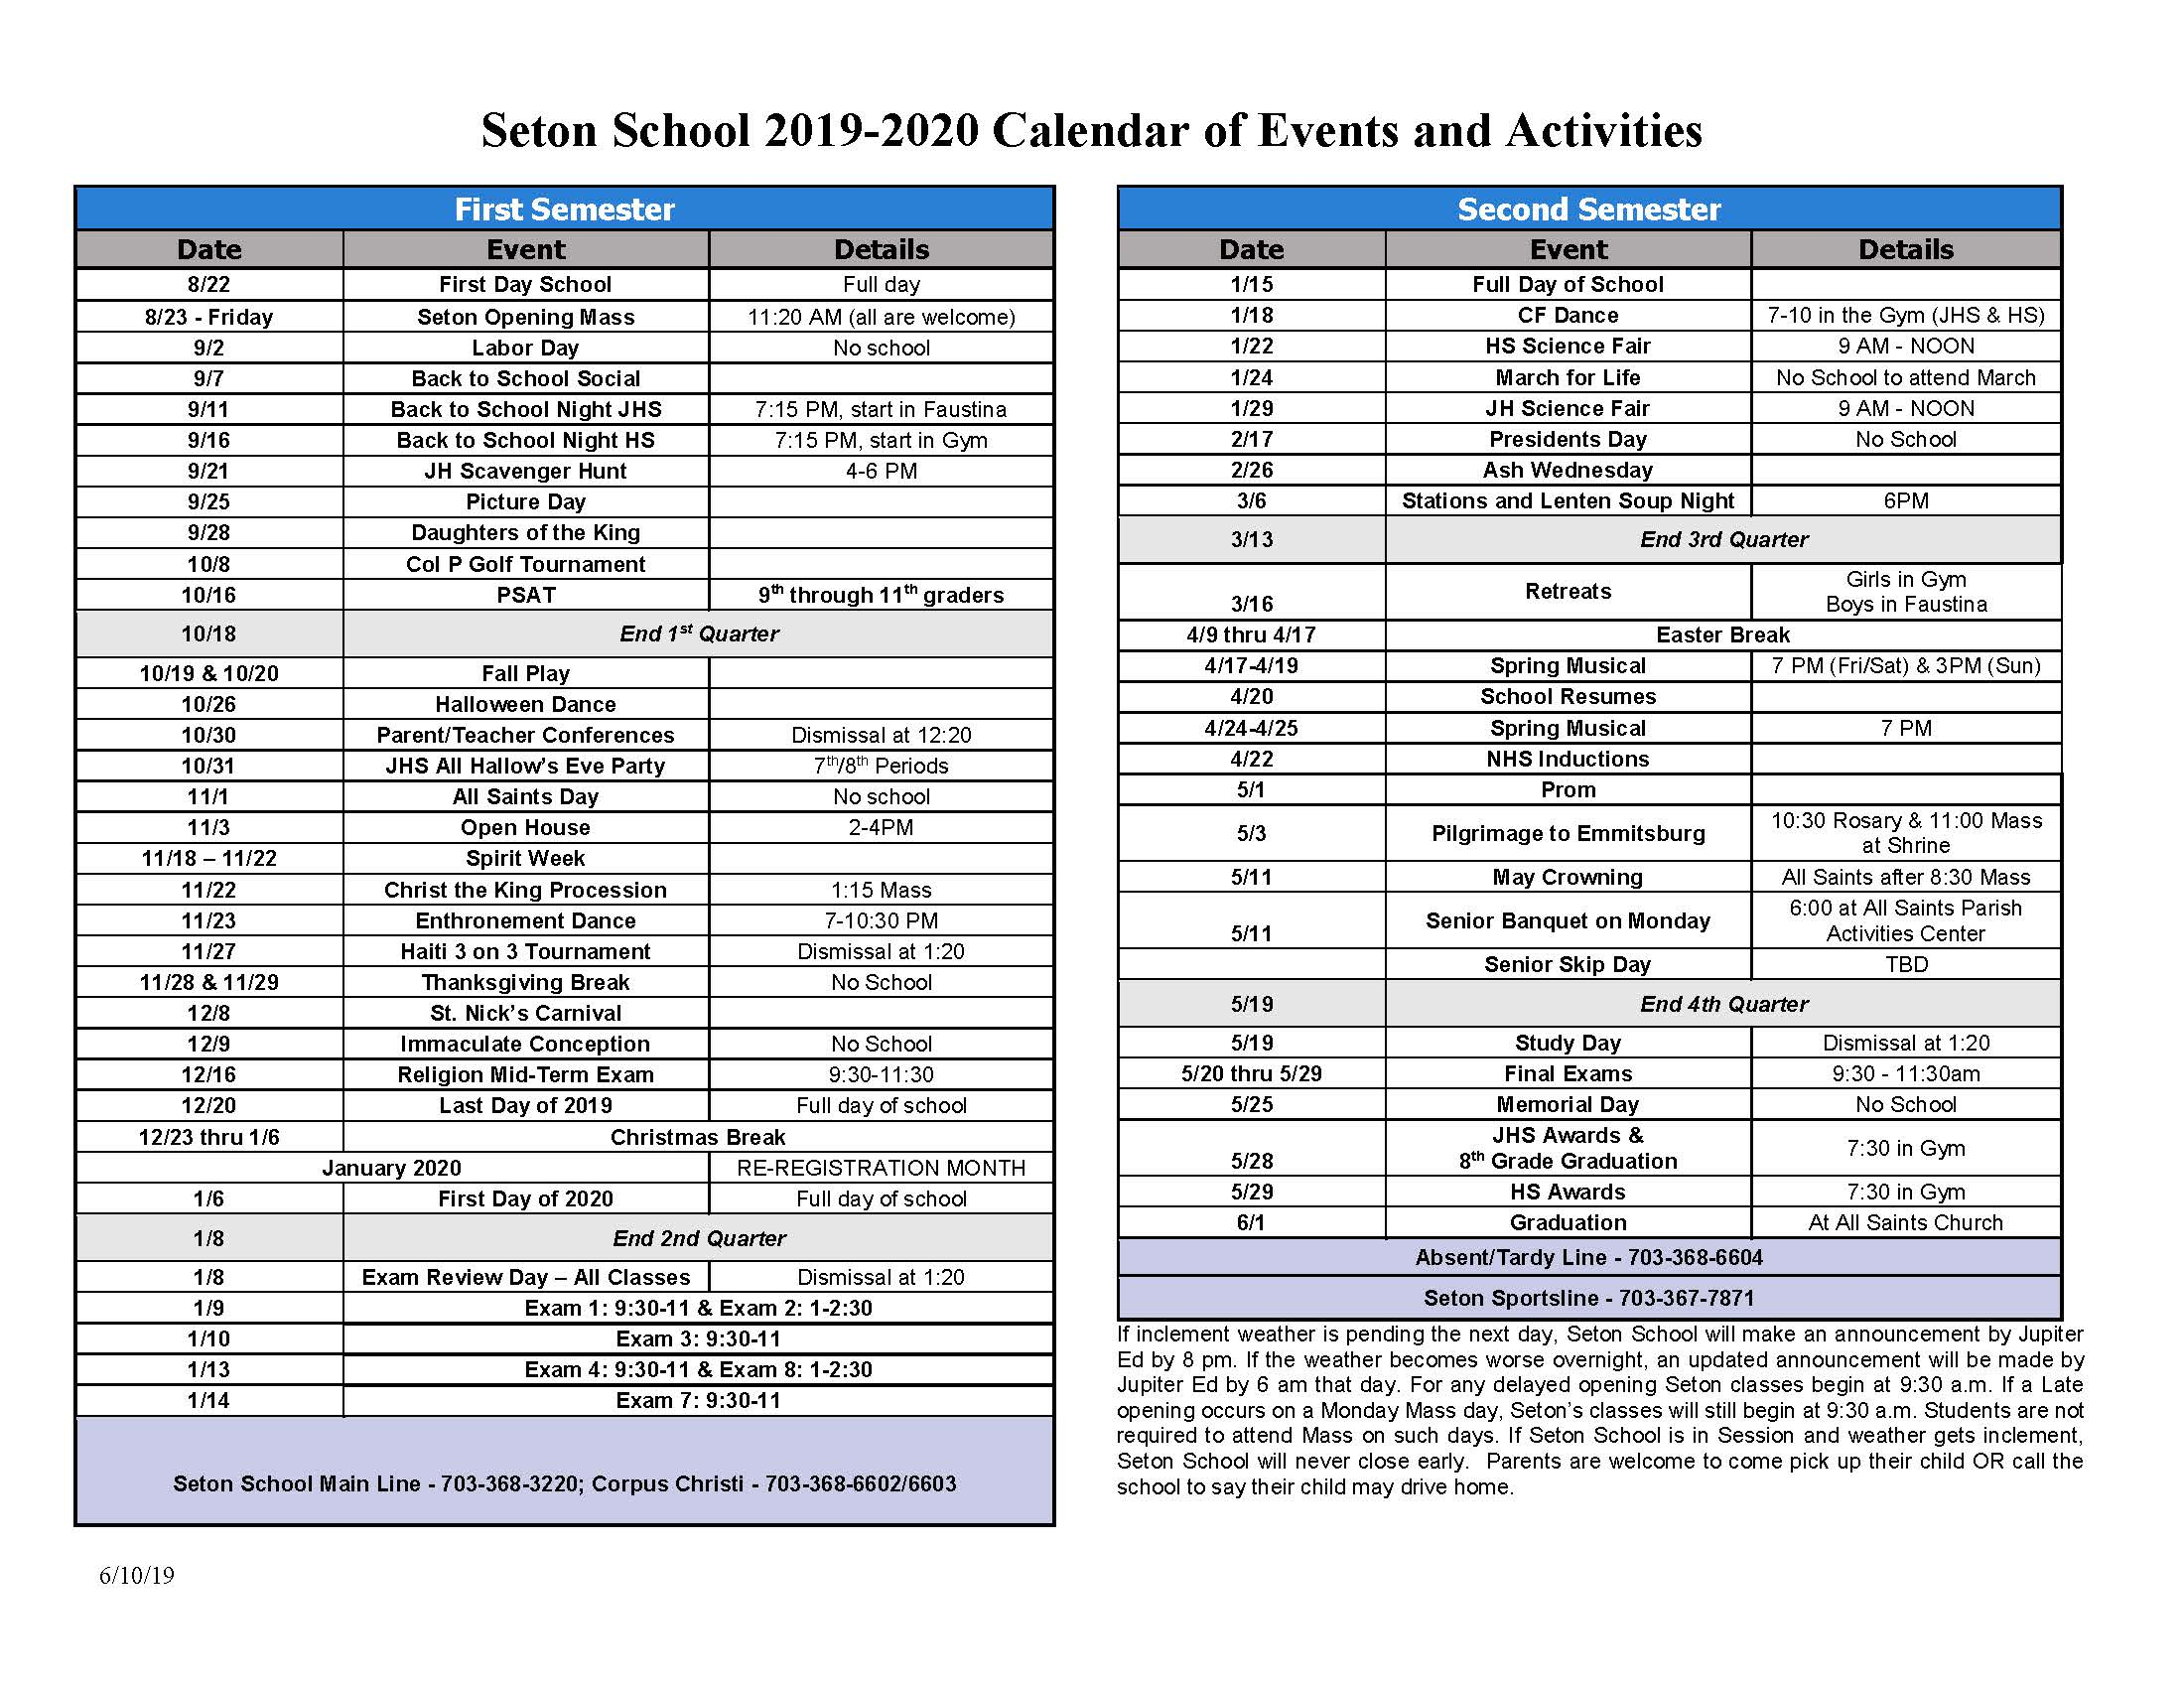 Events Calendar | Seton School Manassas